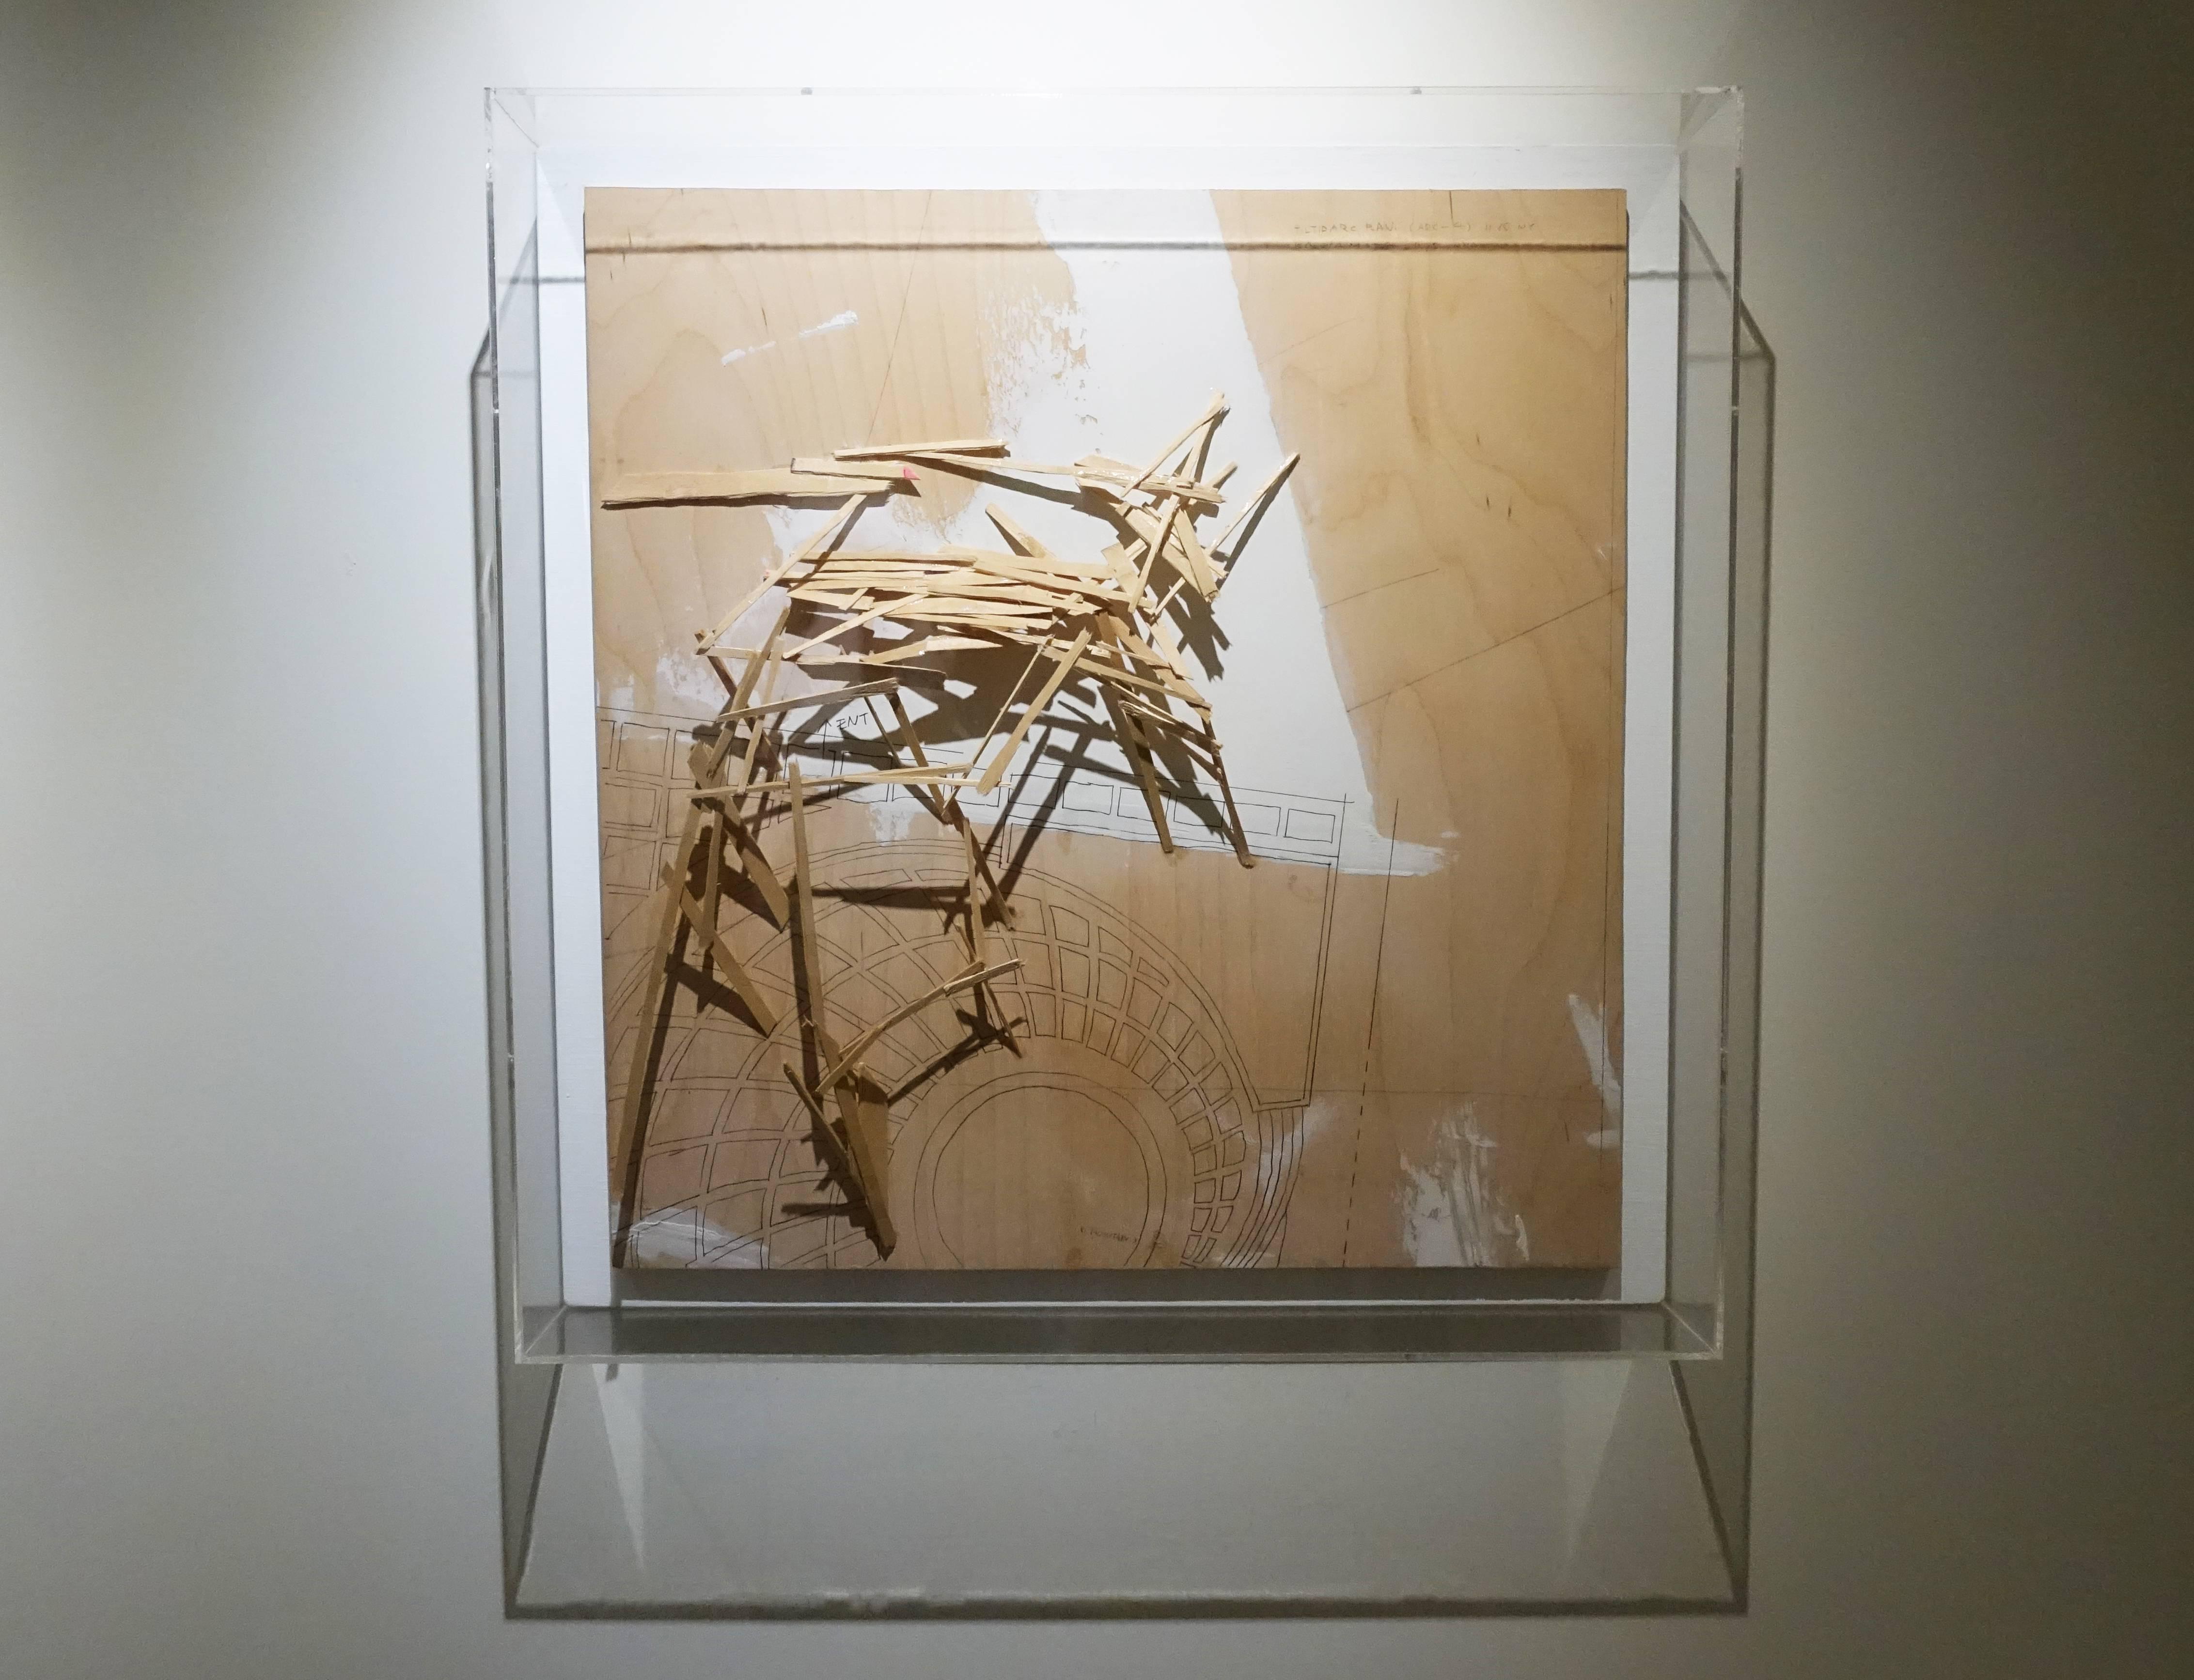 川俣正,《TILTED ARC PLAN(ARC-4)》,58.5 x 58.5 cm,木に彩色,1985。